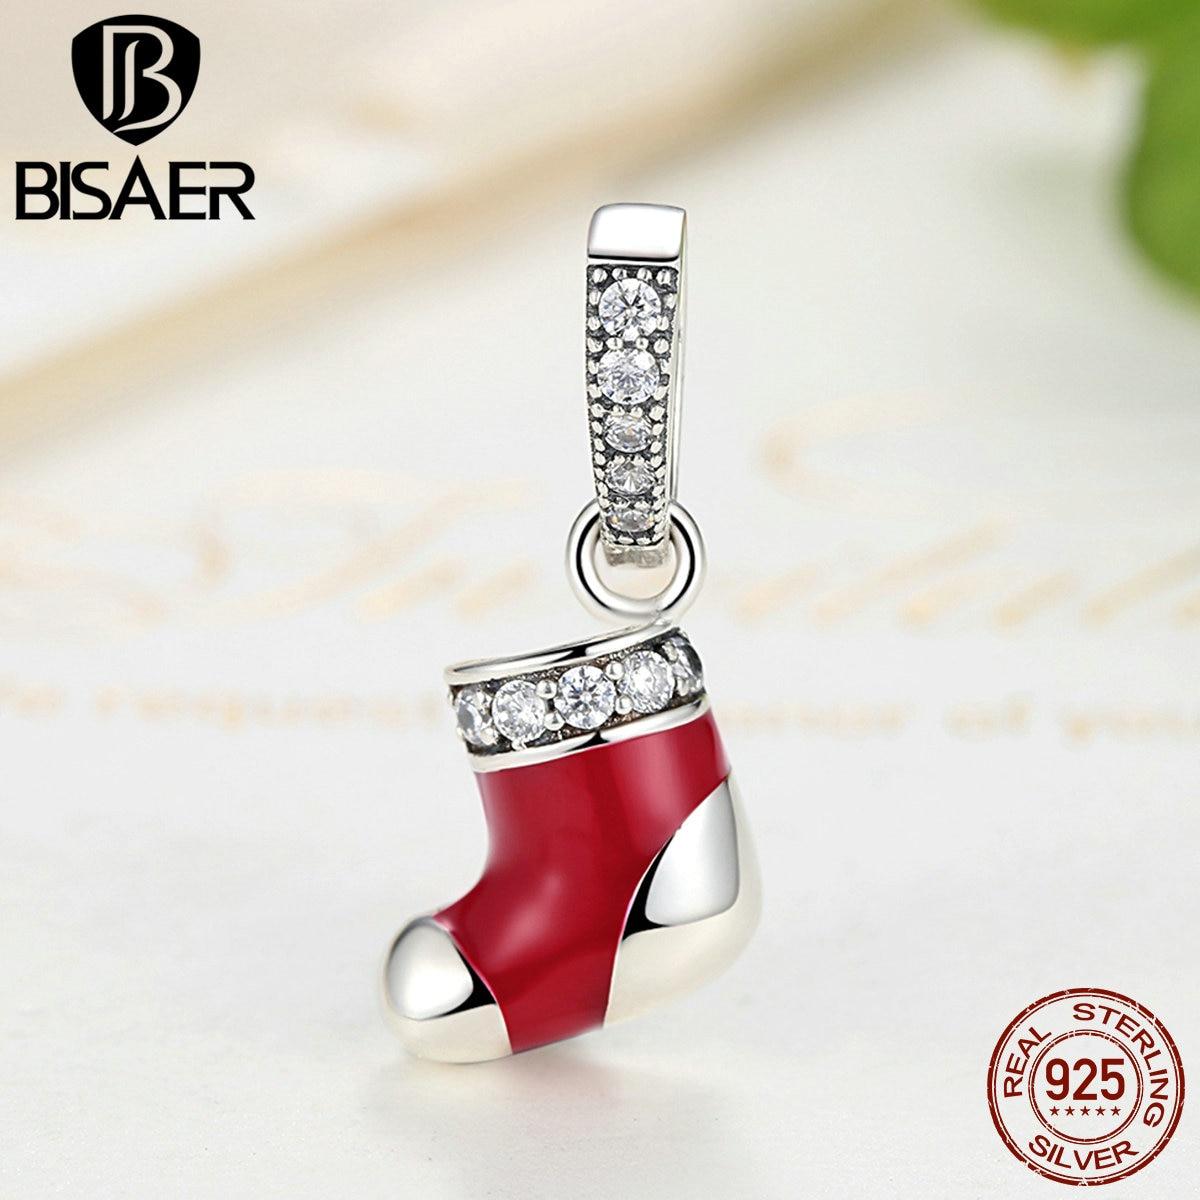 ᗜ LjഃBisaer genuino 925 plata esterlina rojo Navidad Calcetines ...